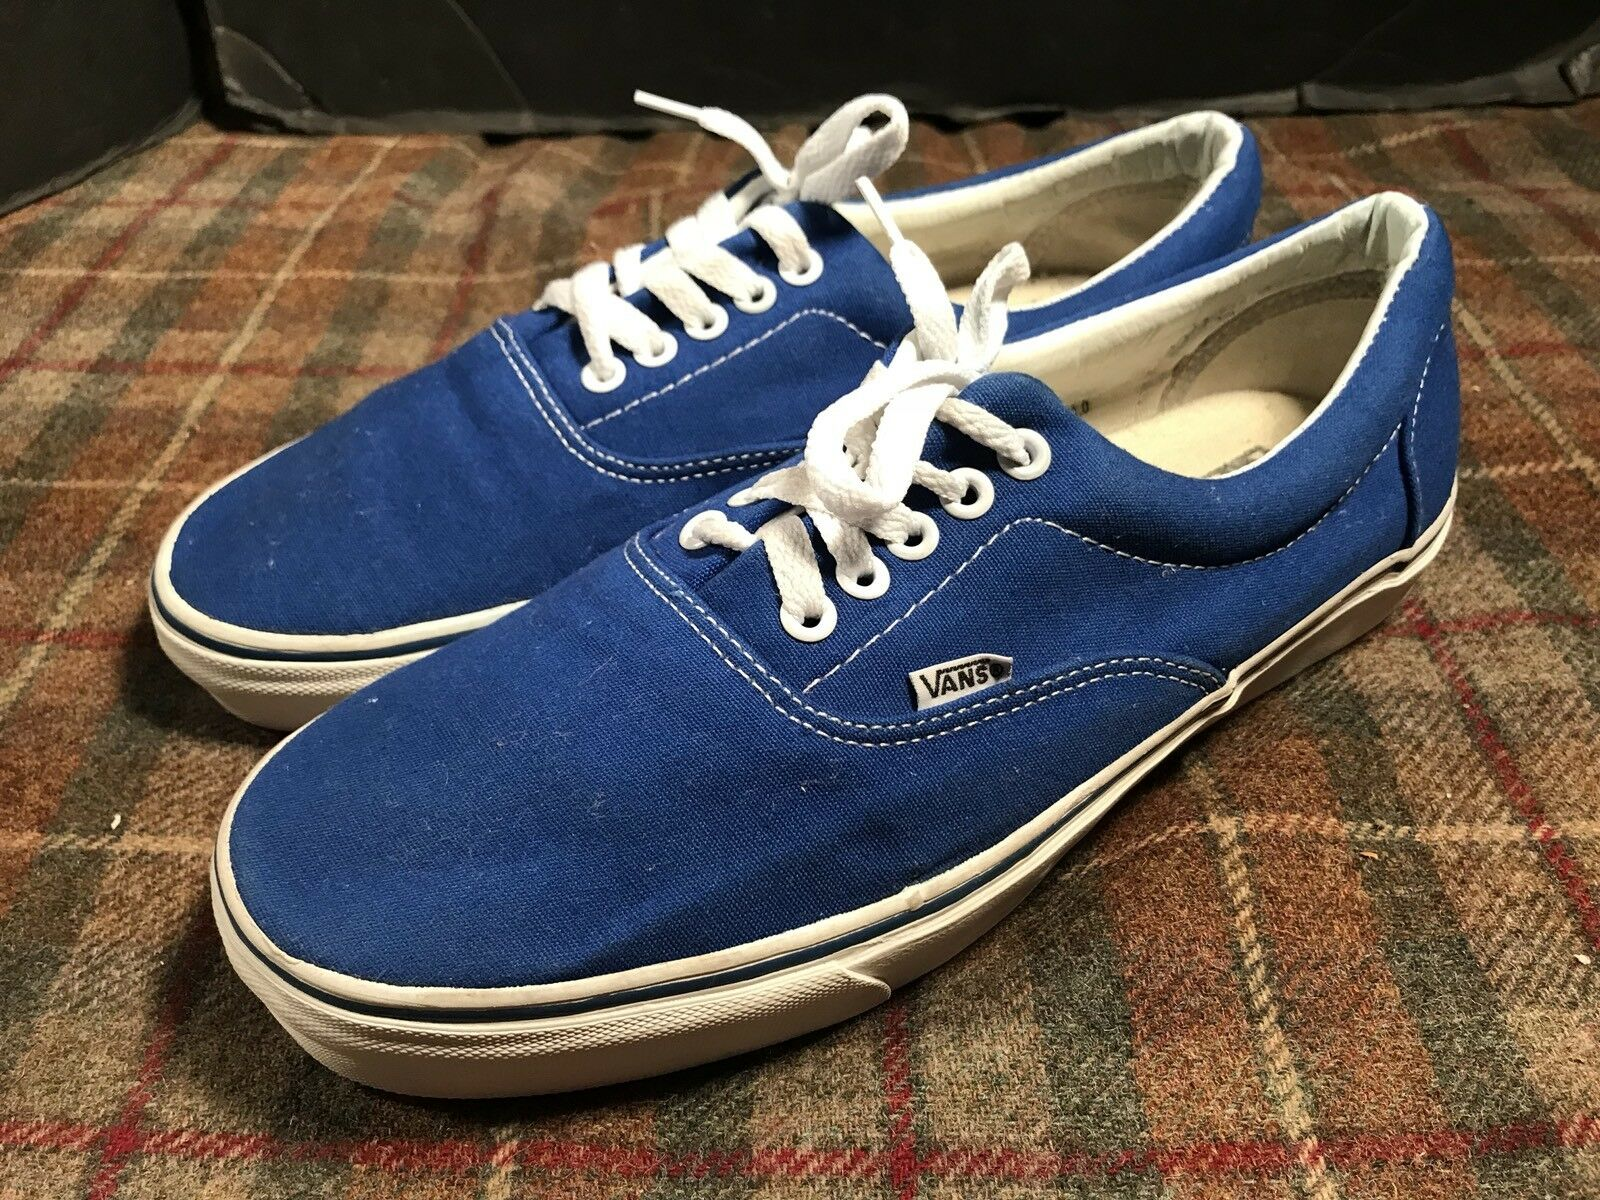 VANS USA Vintage Shoes Uomo Sz 11 USA VANS Made Blue Hardly Worn 380ec1